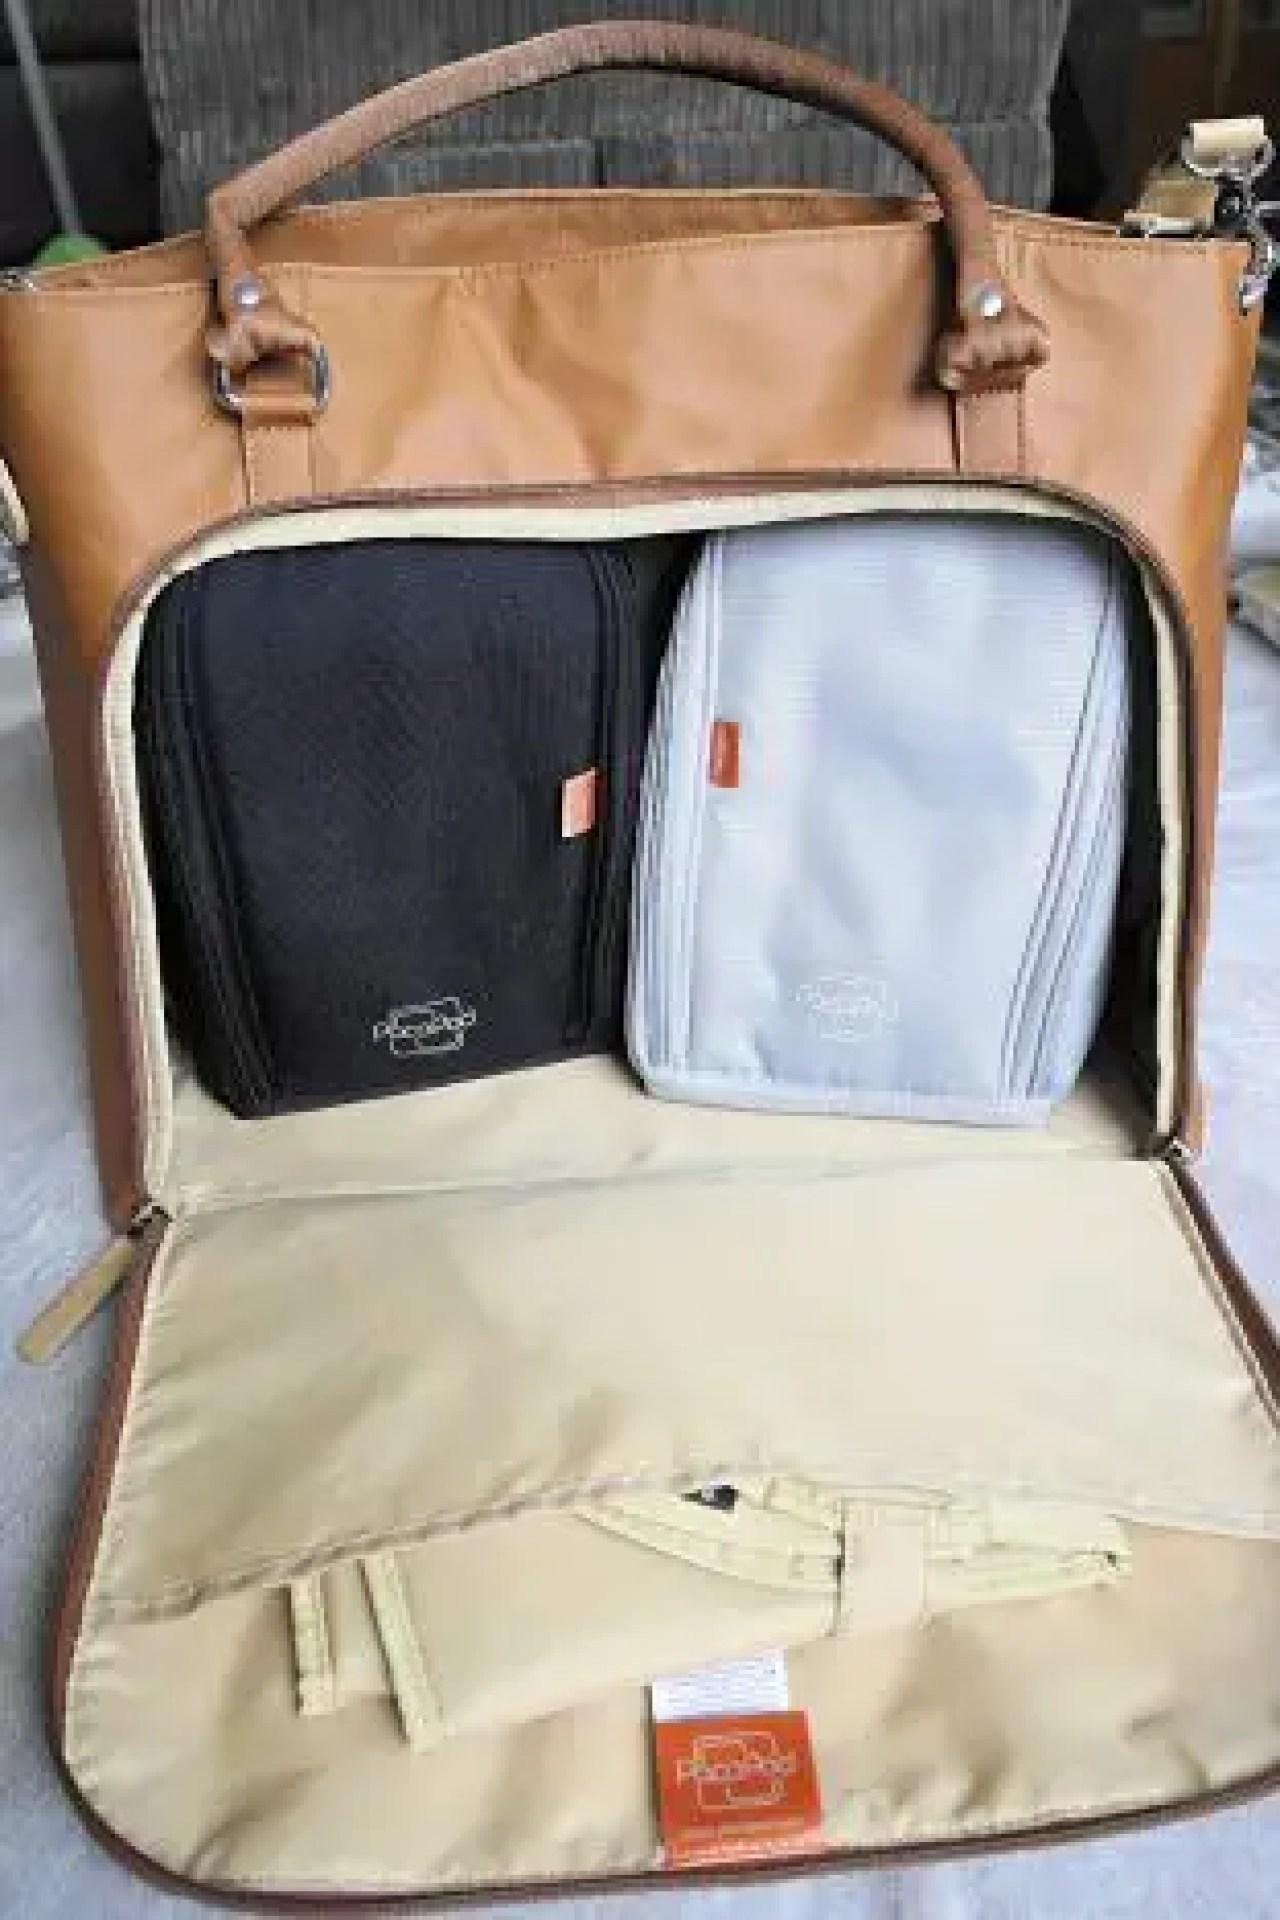 Changing Bag PacaPod mirano pods